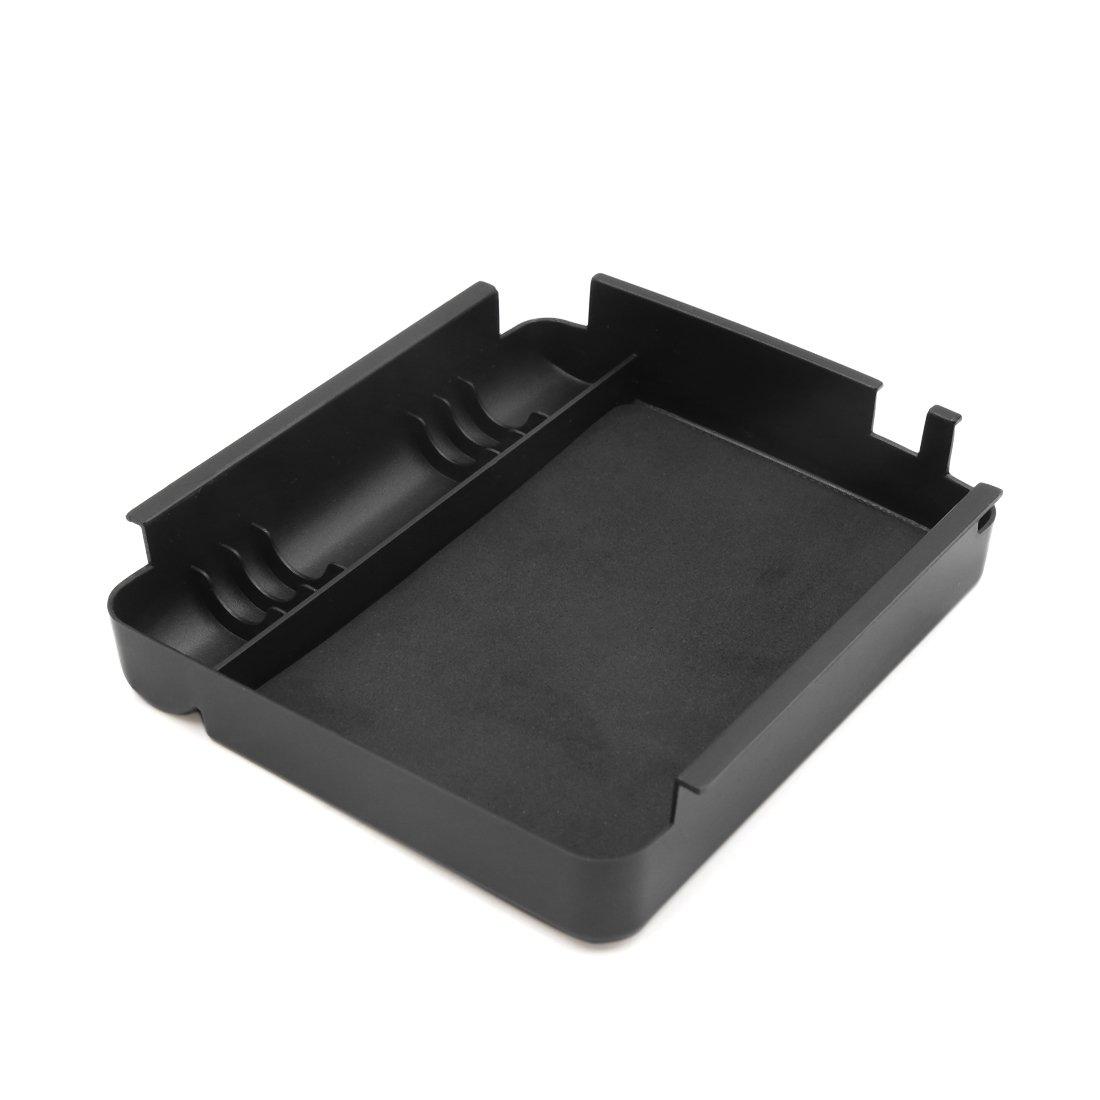 sourcing map Armrest Storage Organizer Center Console Tray Holder Divider for Car